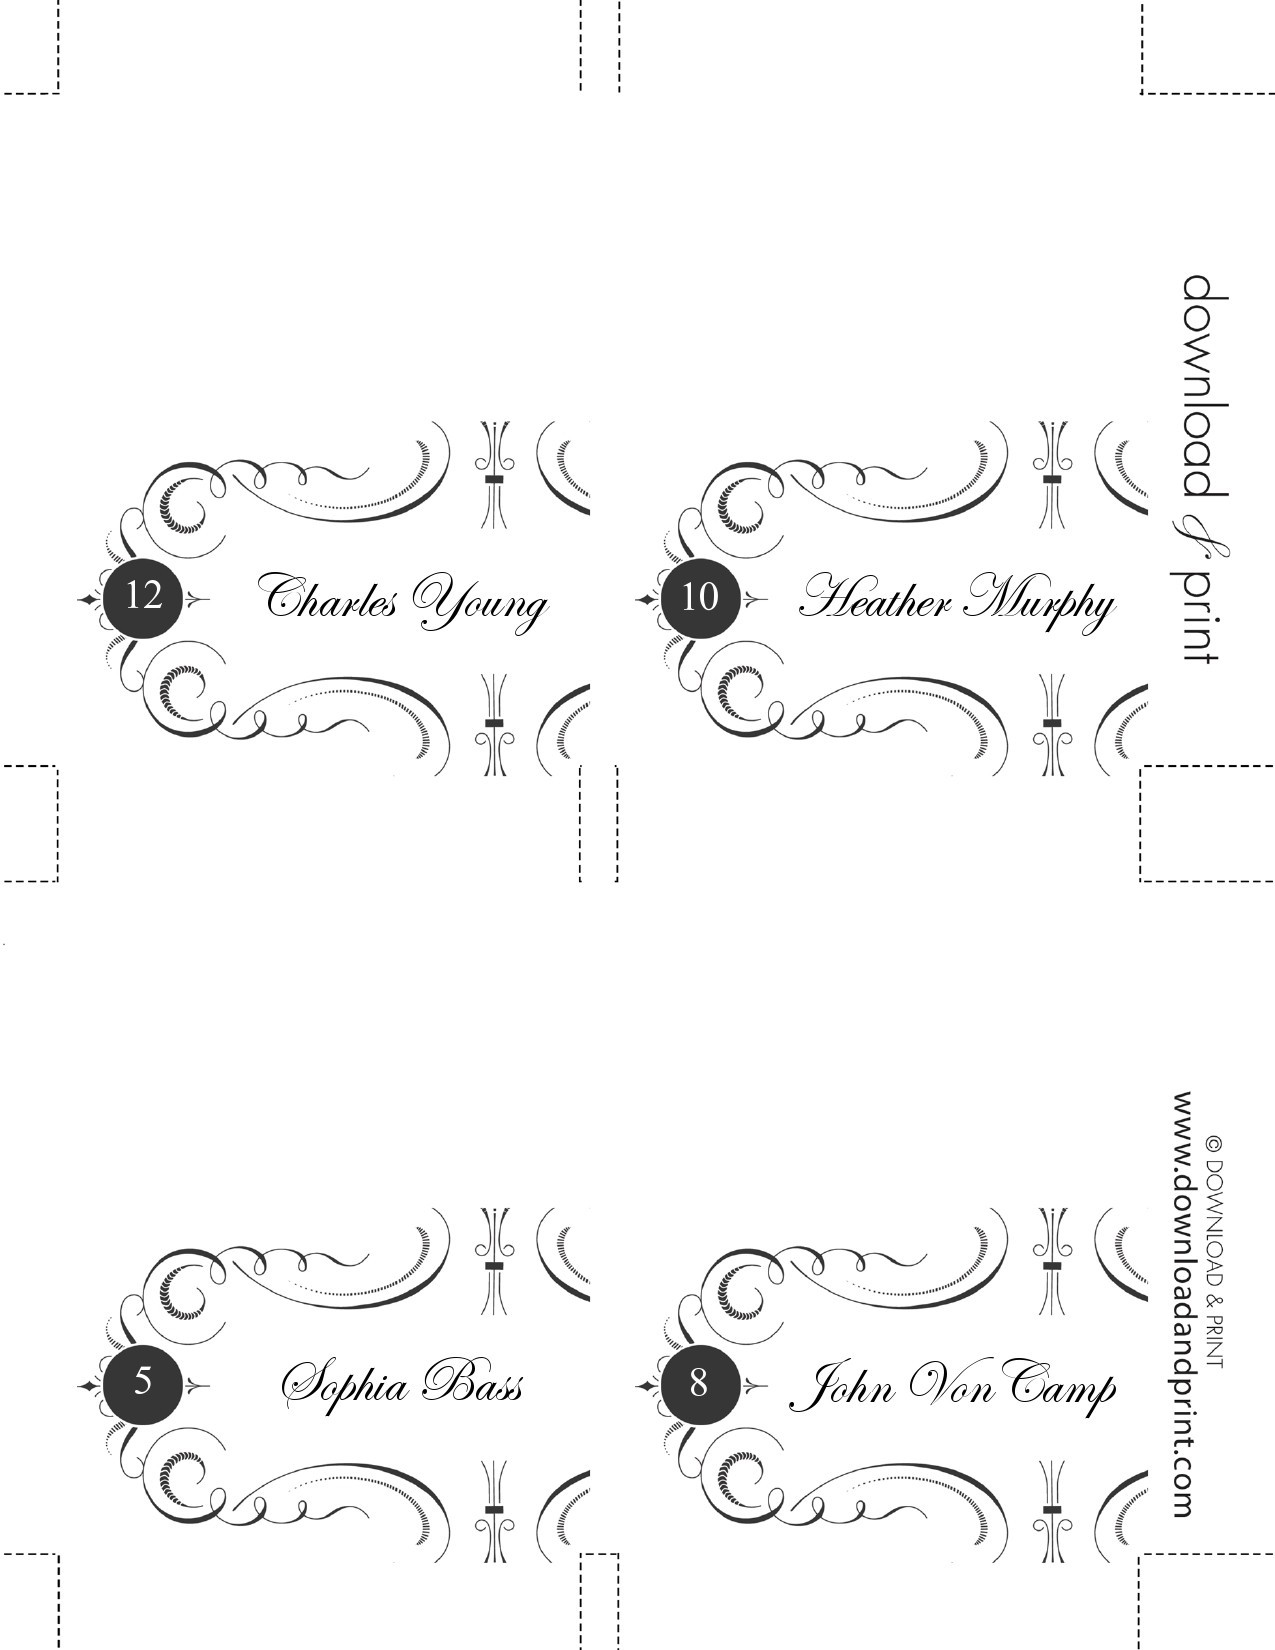 50 Printable Place Card Templates Free Á… Templatelab